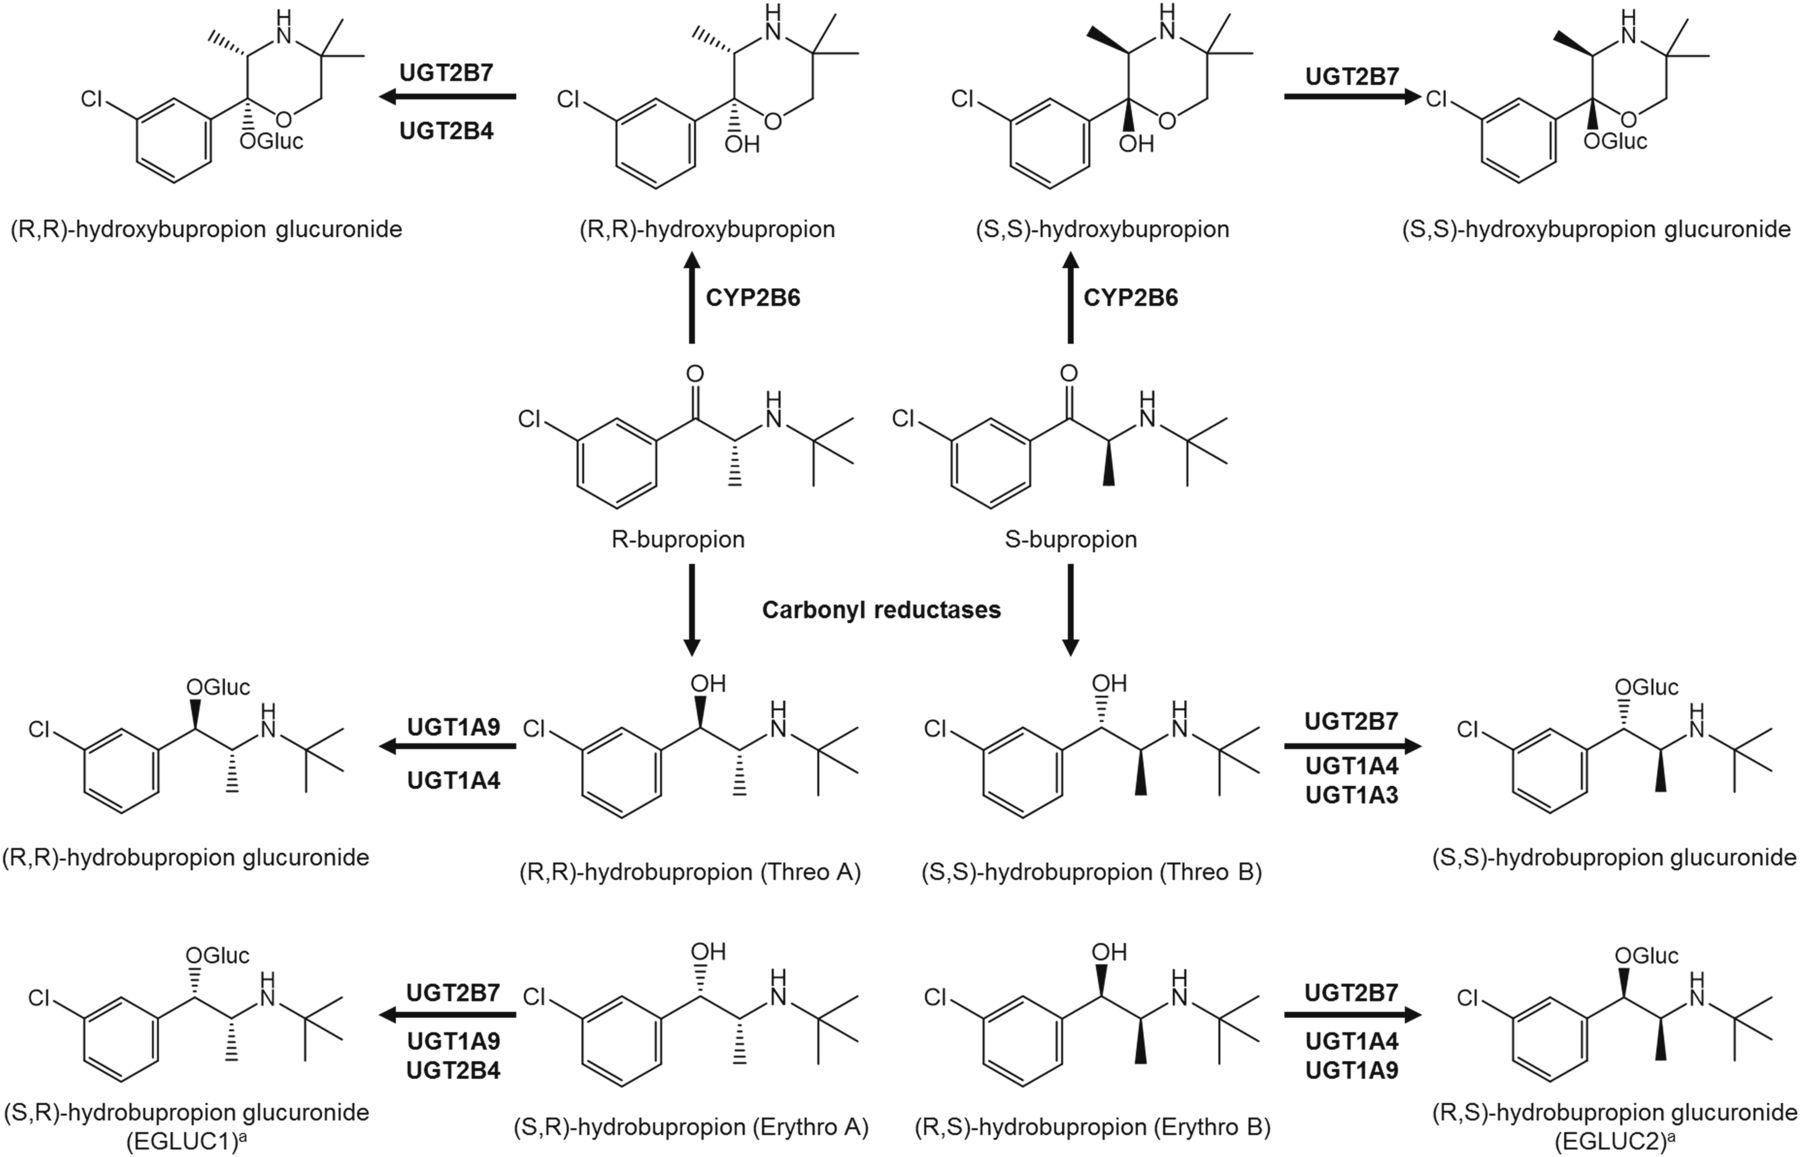 bupropion metabolites